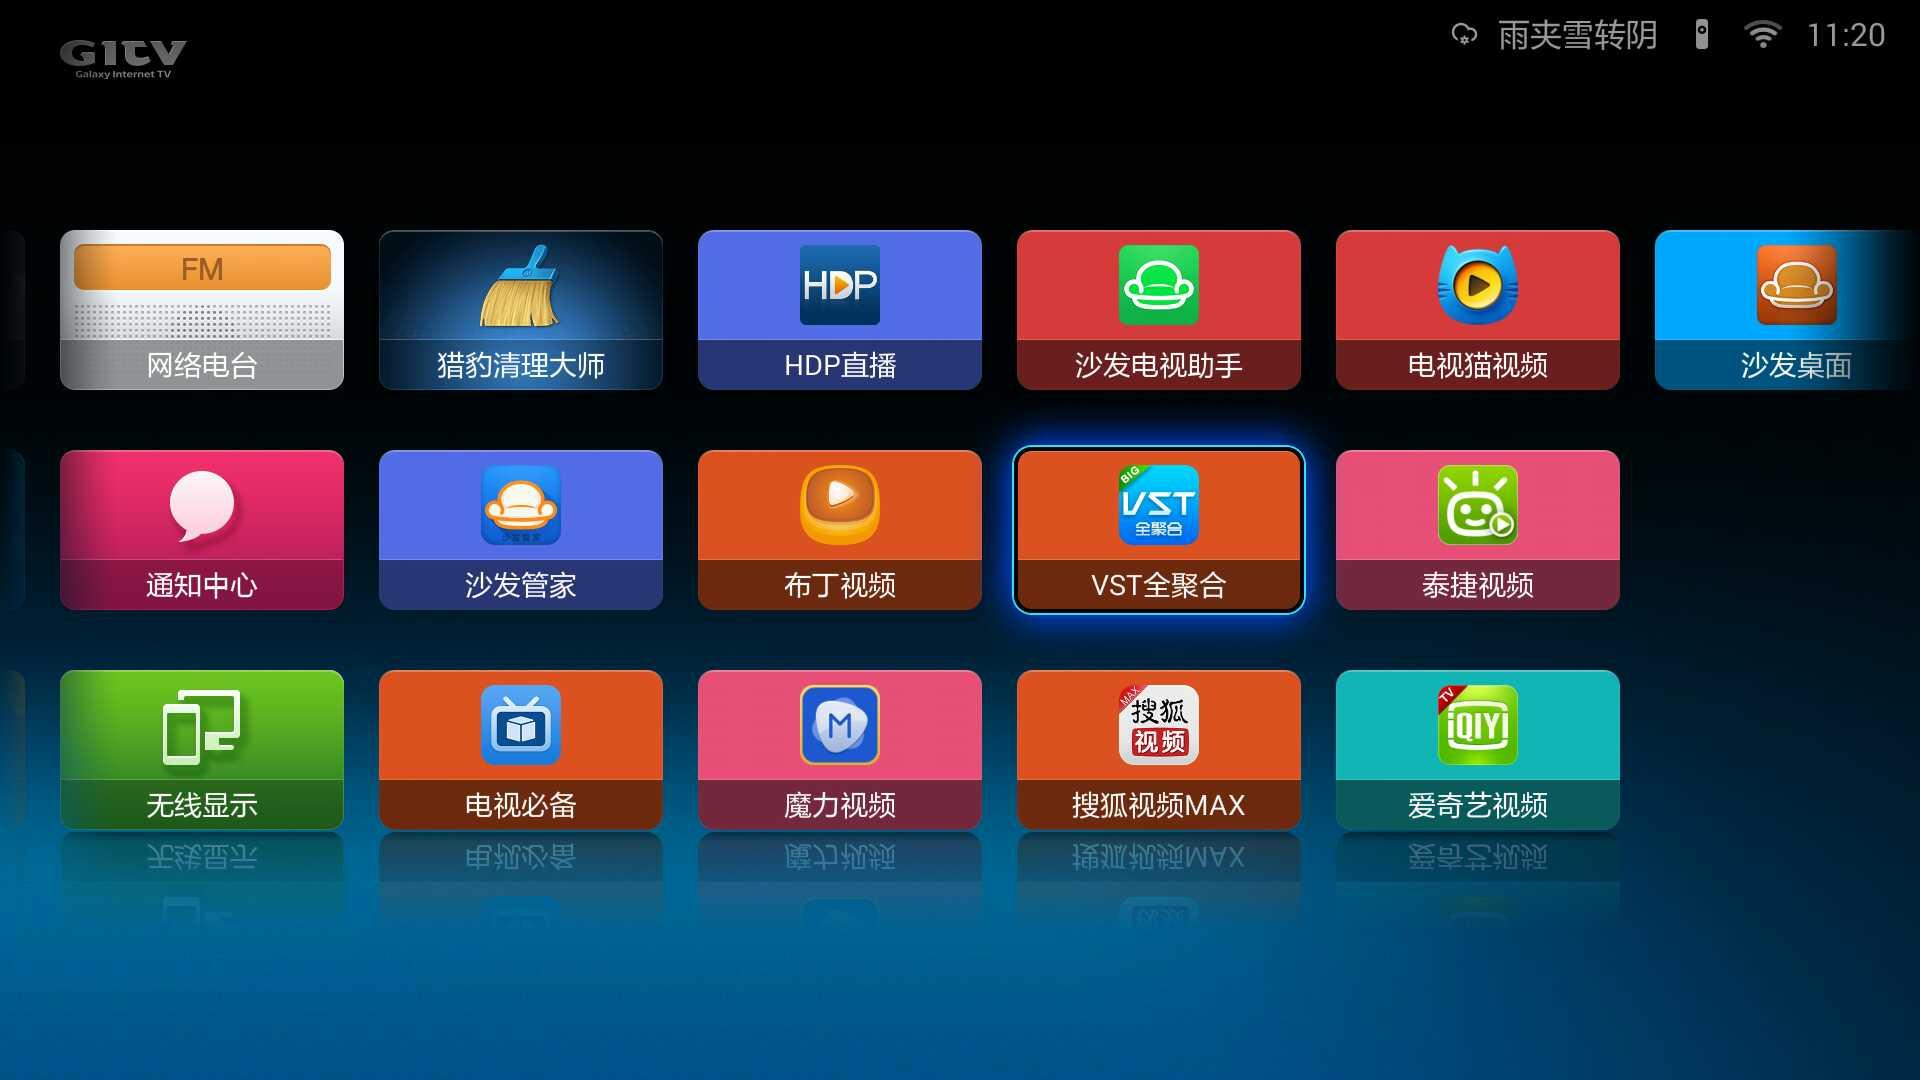 MITVScreenshot1425093606571.png